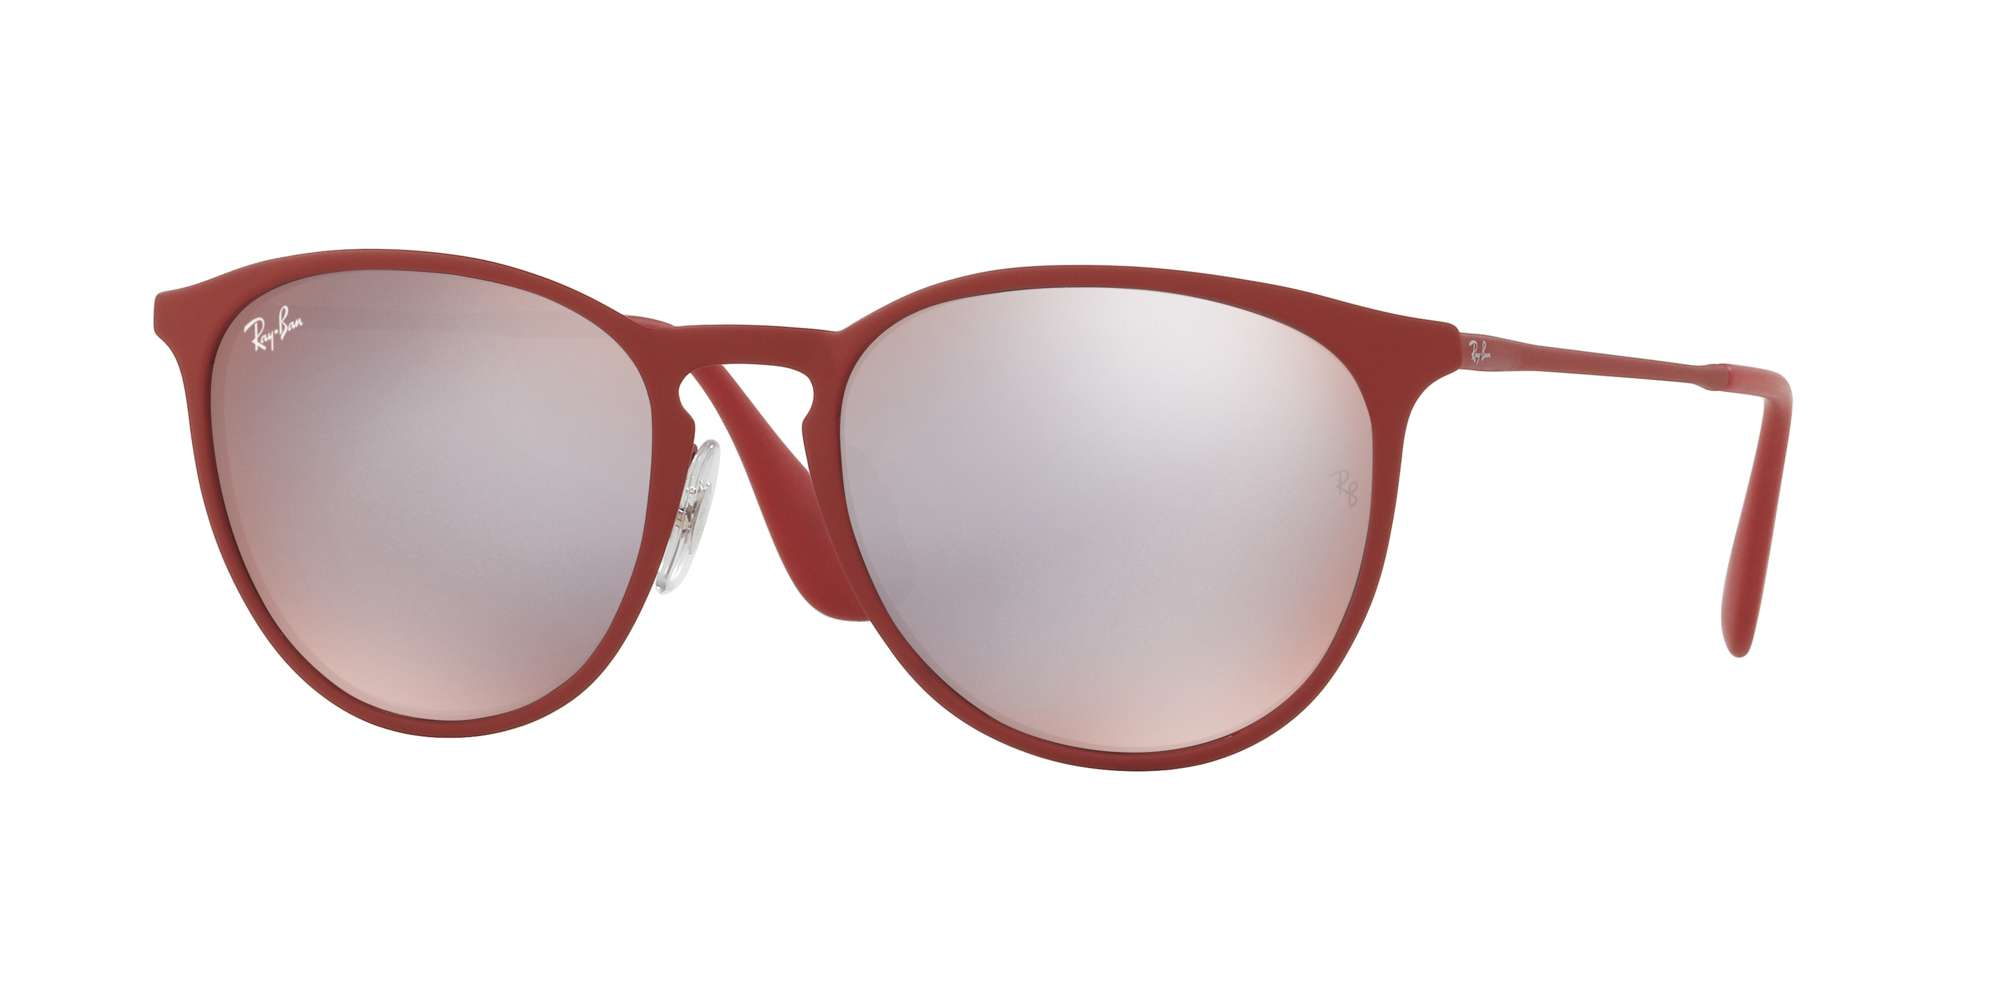 RUBBER BORDO' / BORDO' LIGHT FLASH GREY lenses